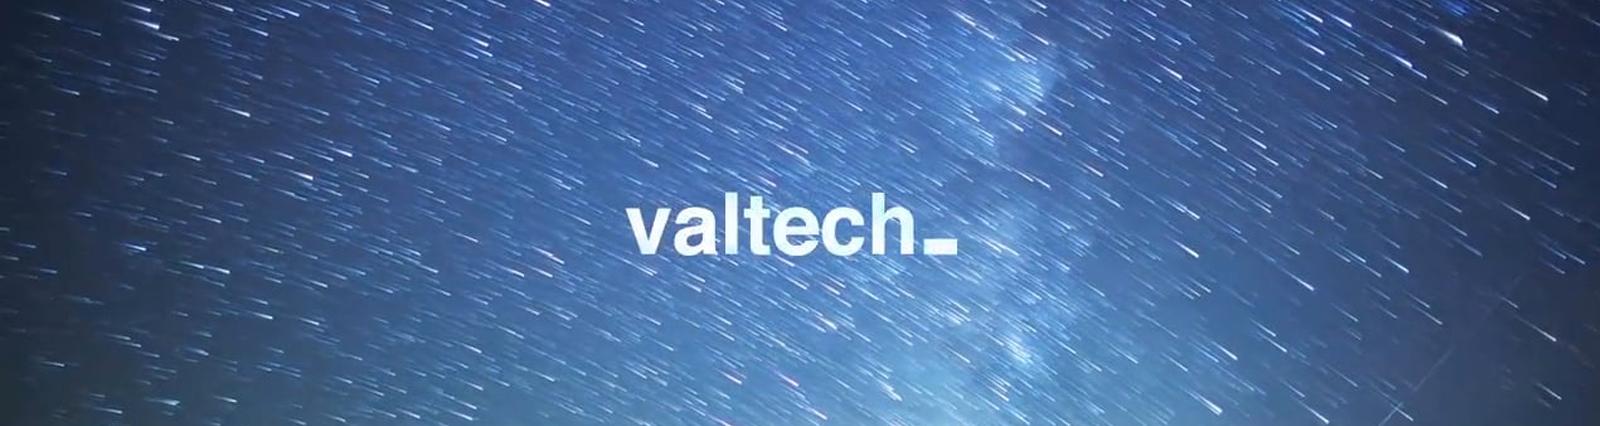 Valtech Hero